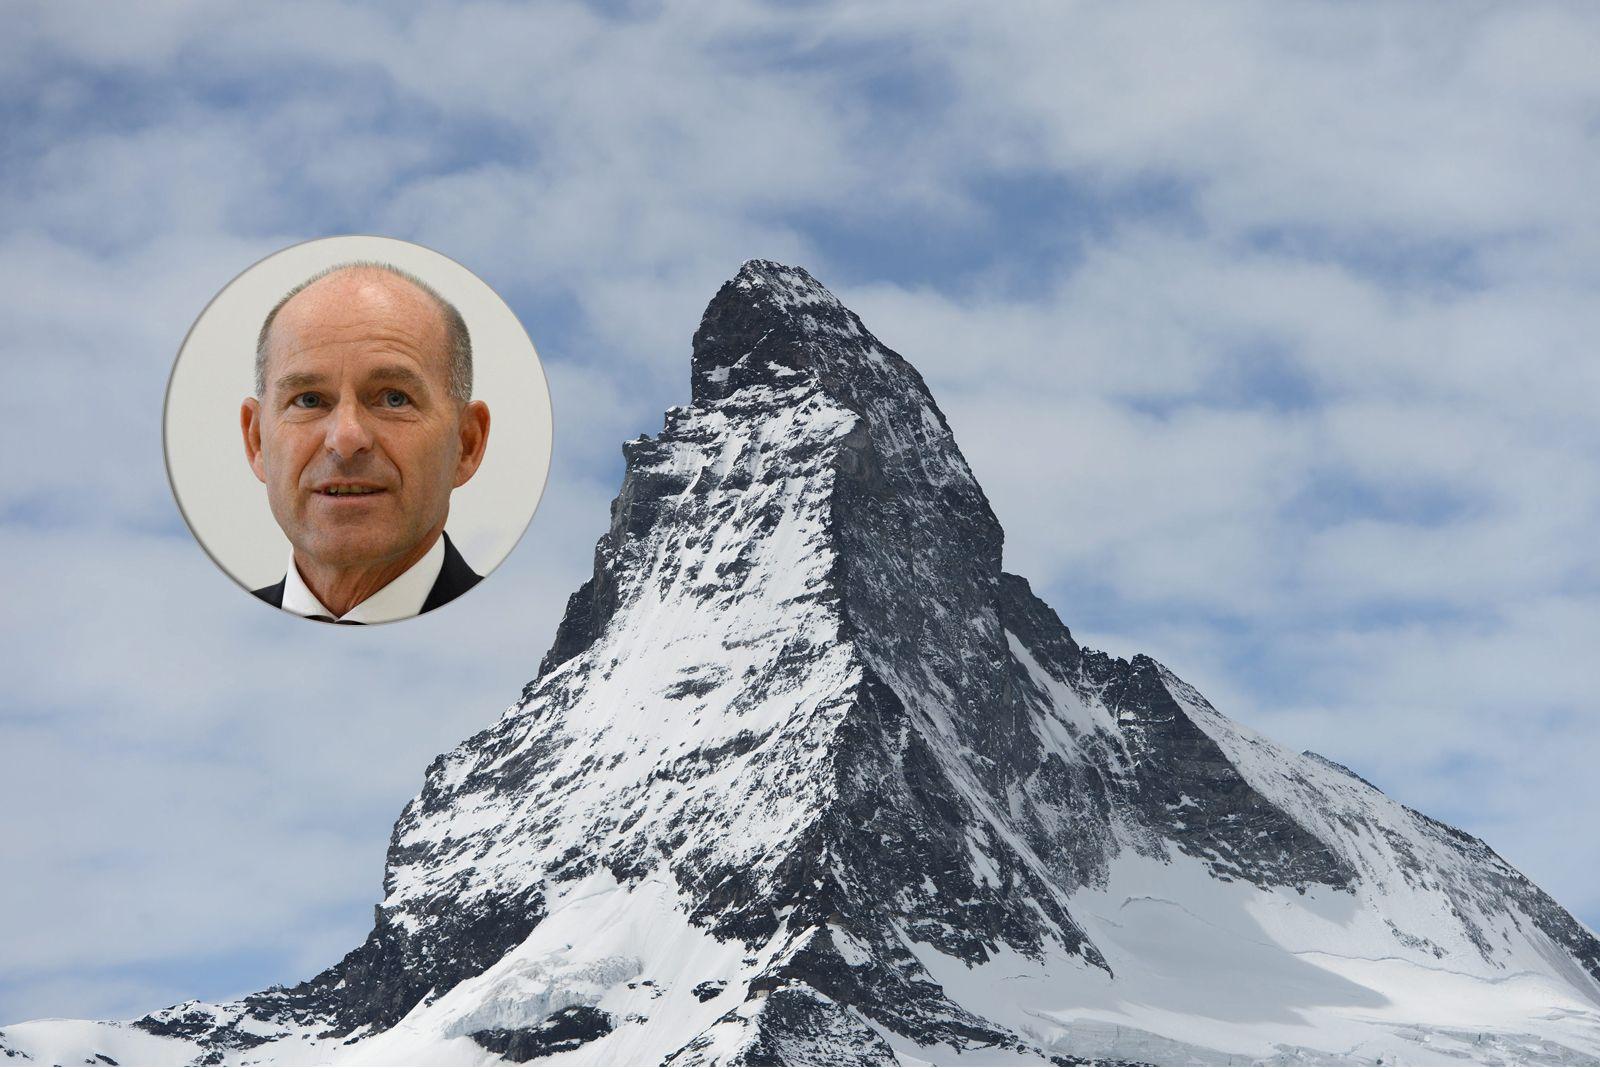 KOMBO Matterhorn / Karl-Erivan Haub